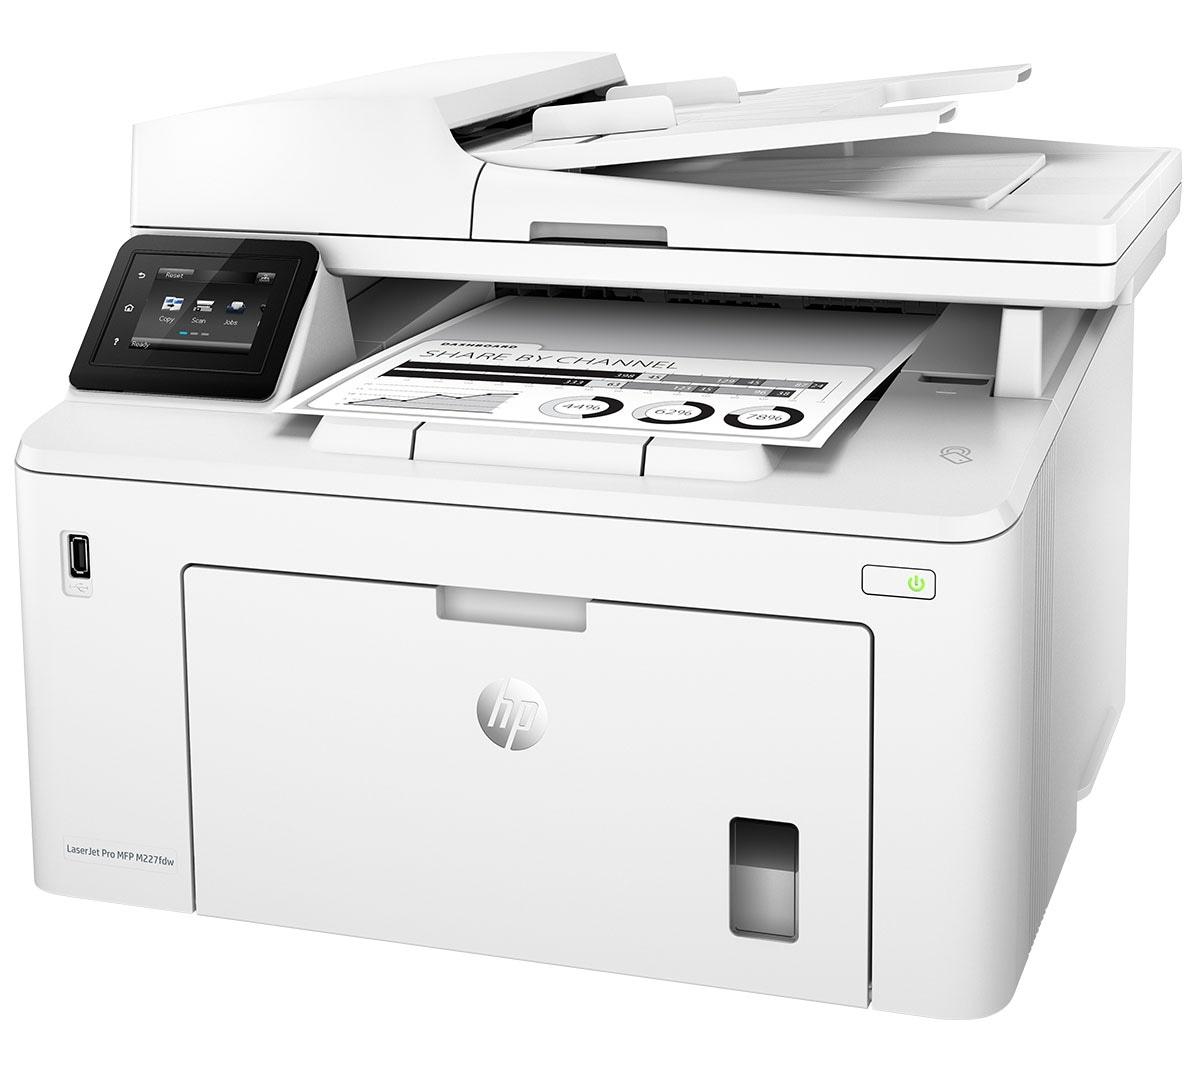 HP G3Q75A LaserJet Pro MFP M227fdw Multi-Function Print Color Laser Printer